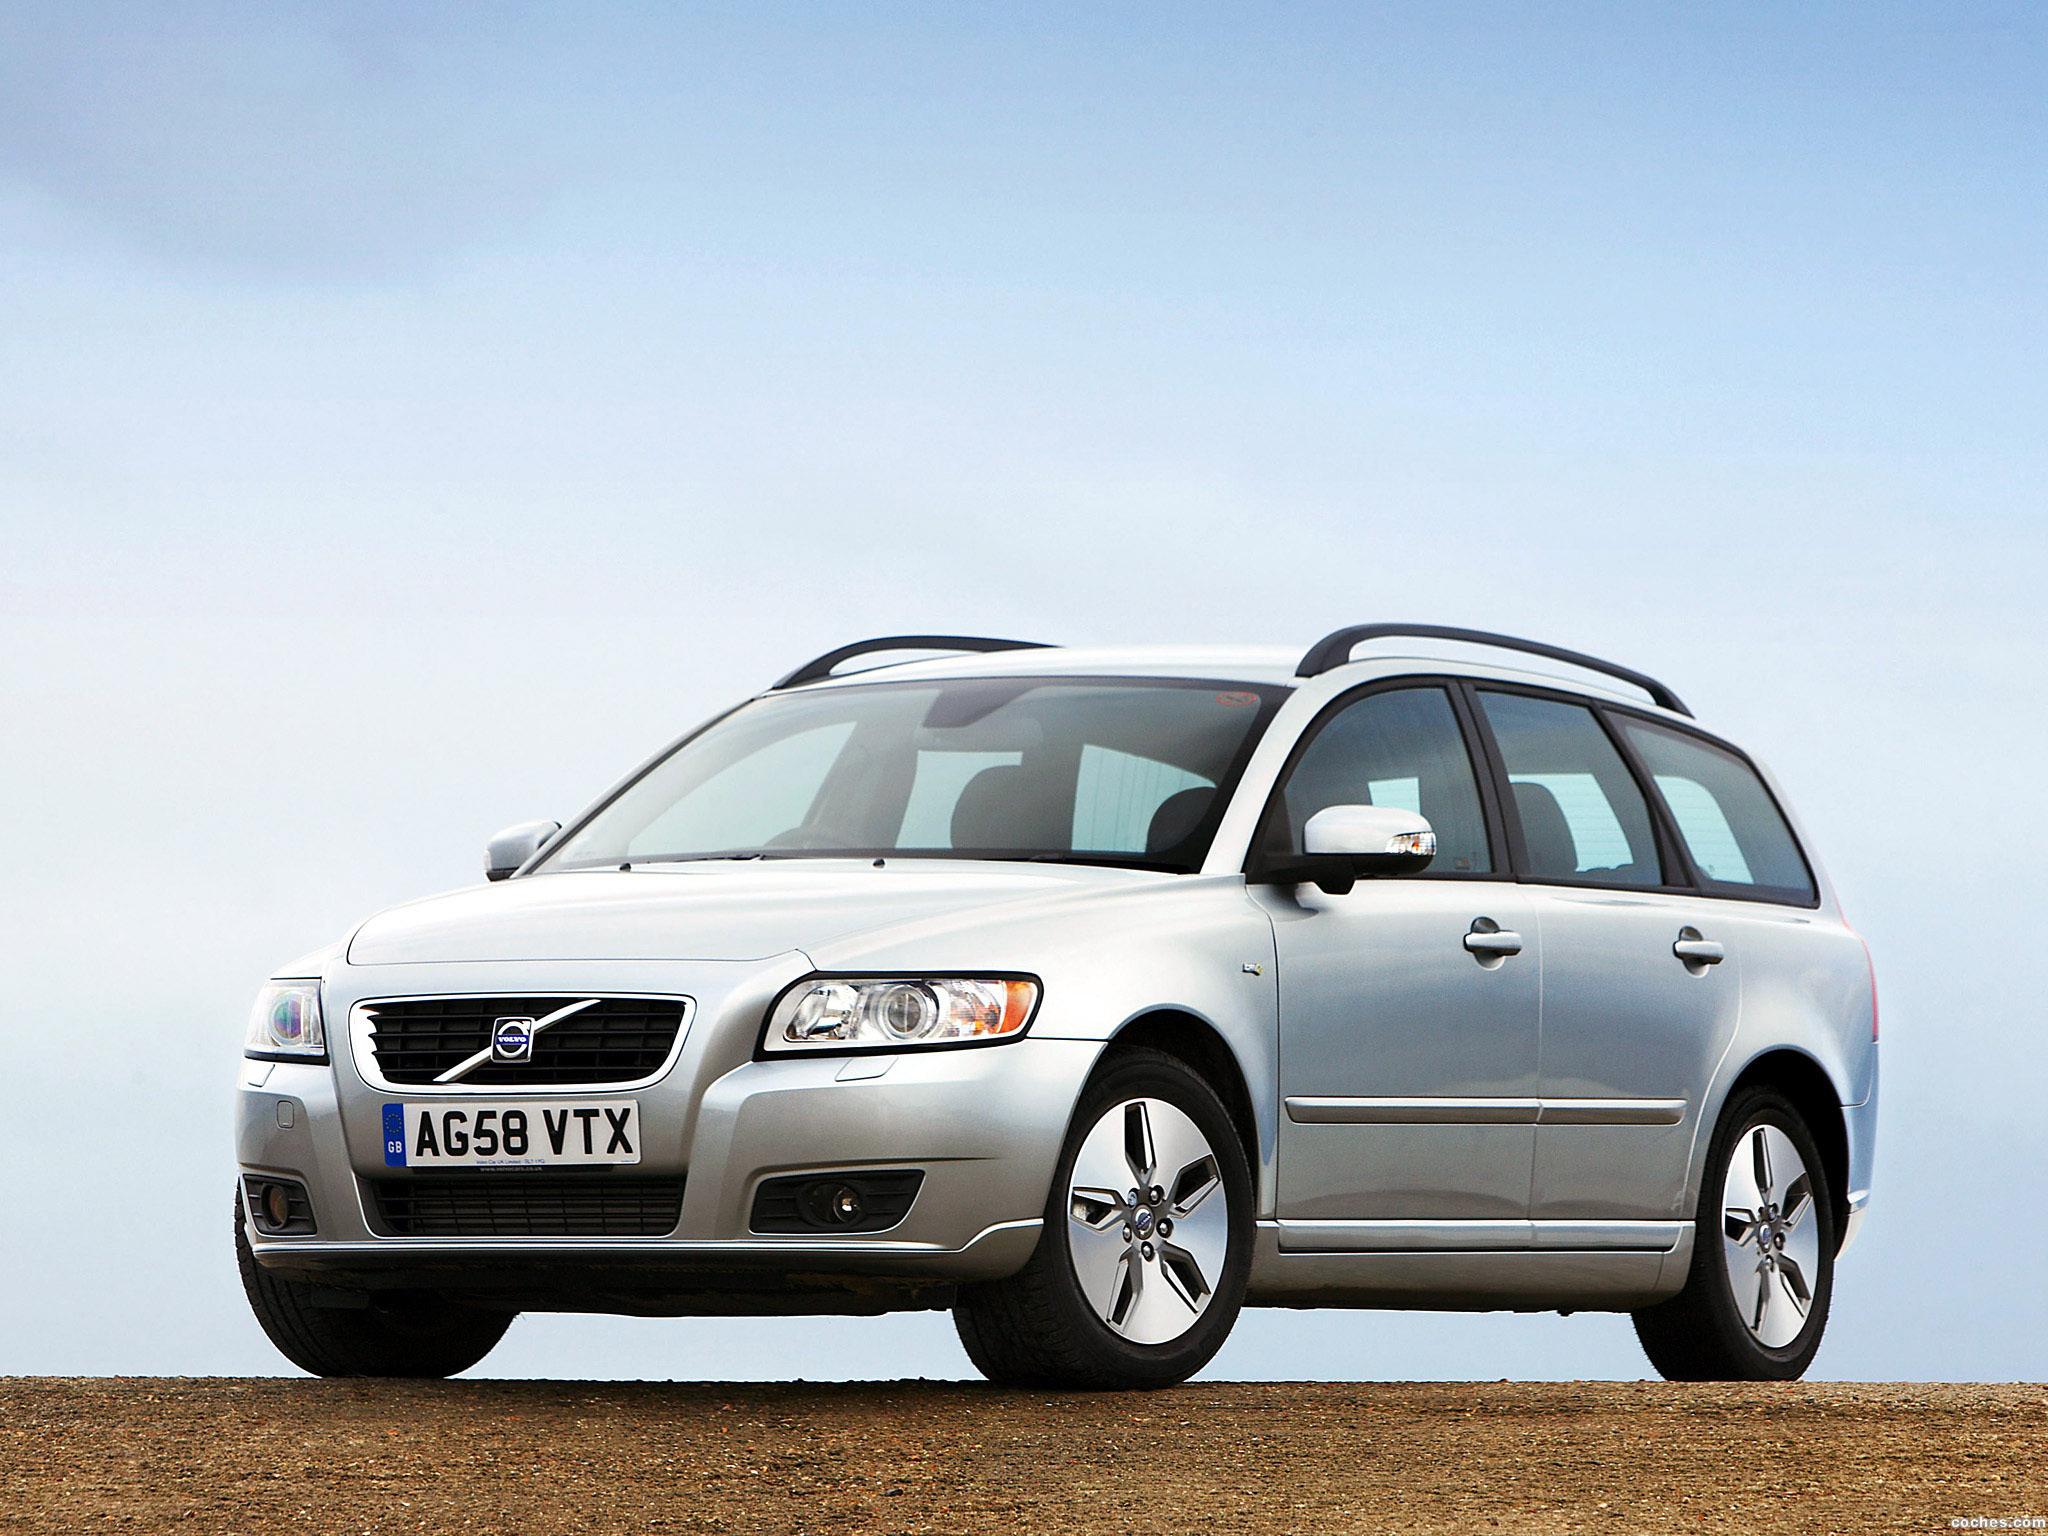 Foto 0 de Volvo V50 DRIVe Efficiency 2009